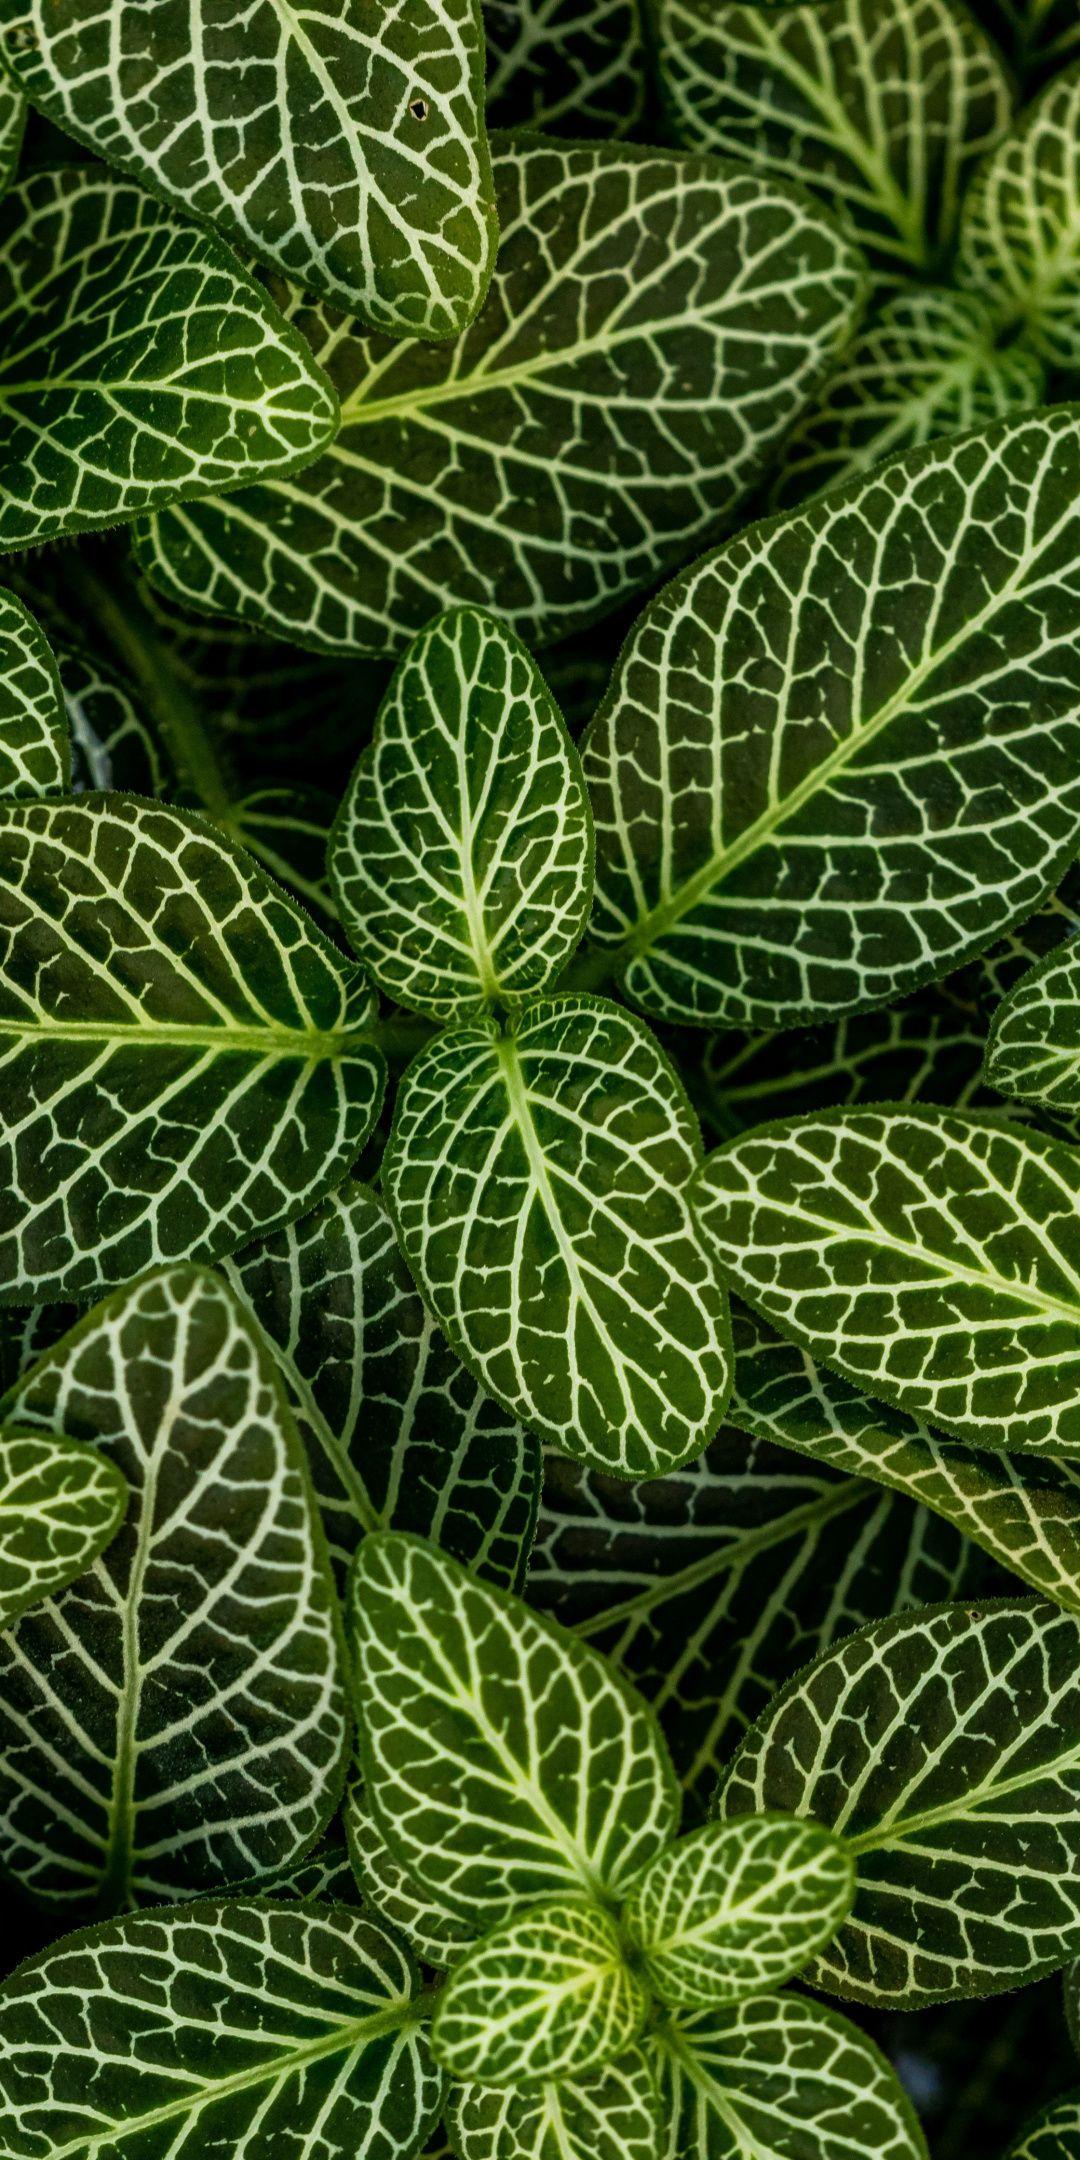 Plants Leaves Green Striped 1080x2160 Wallpaper Leaf